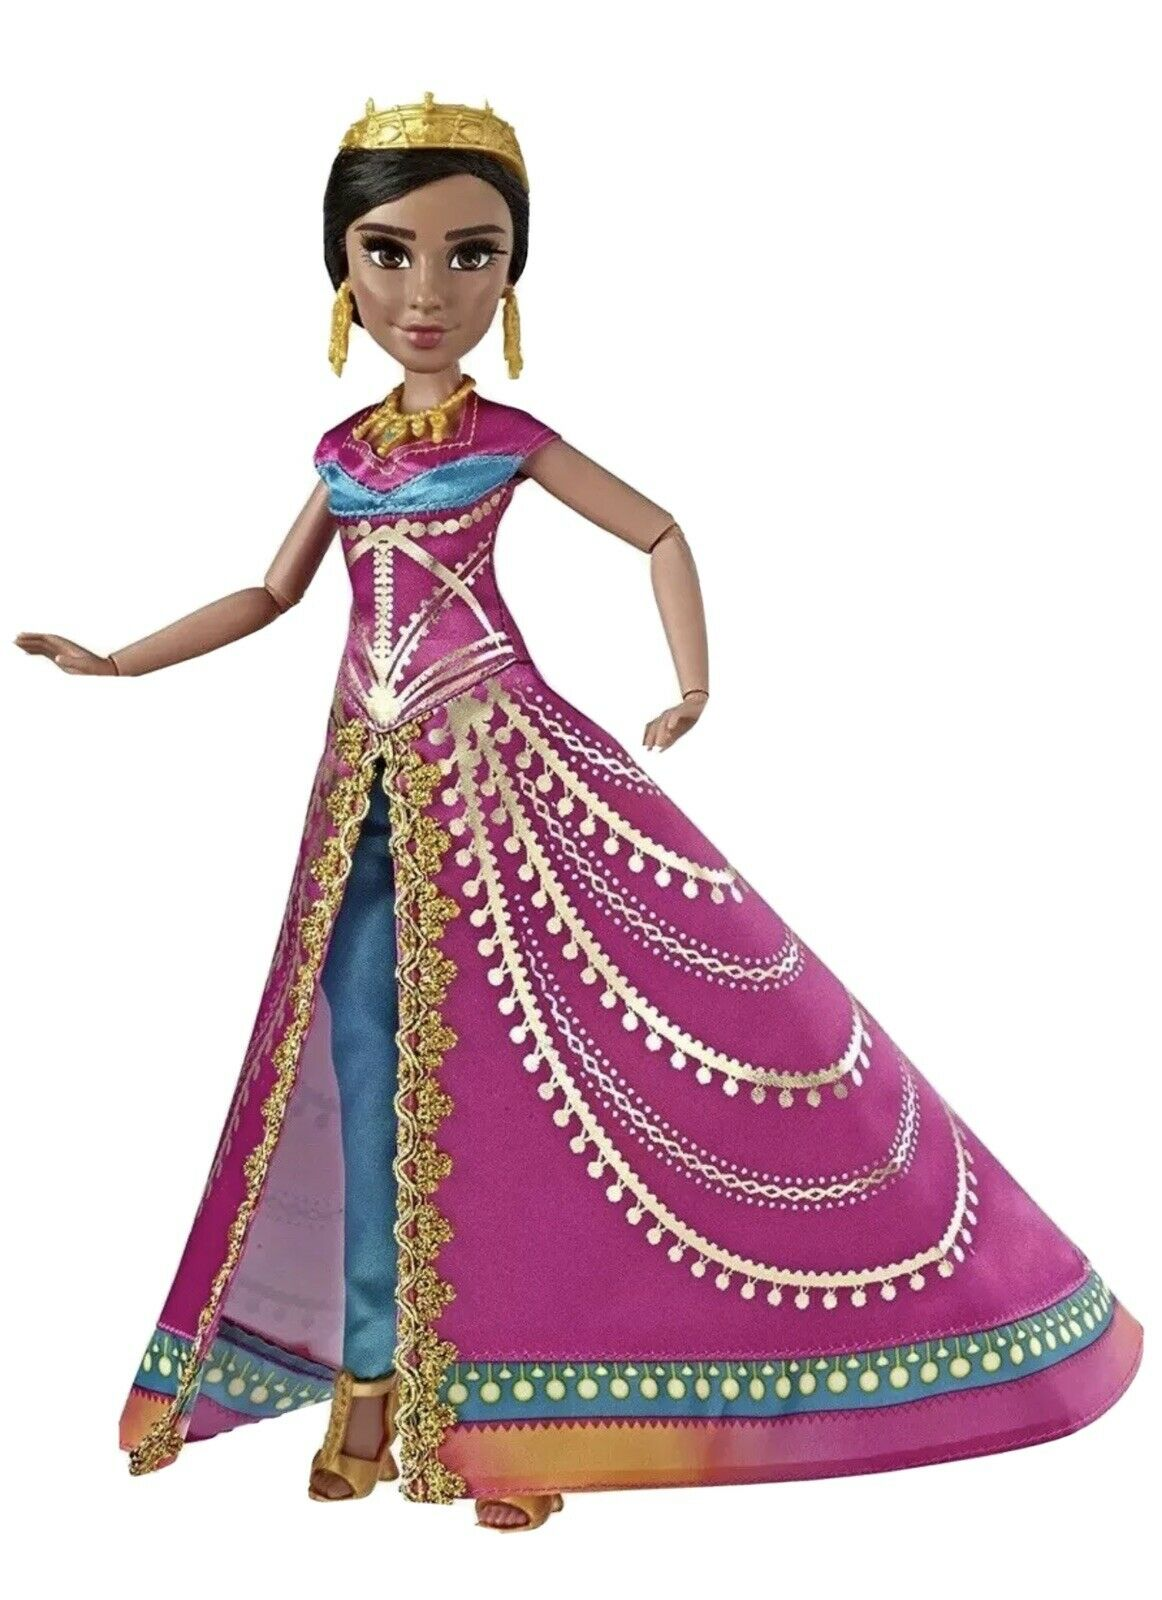 huashun Princess Jasmine Doll Princess Jasmine with Blue Dress and Jeweled Necklace and Crown 14inch Tall